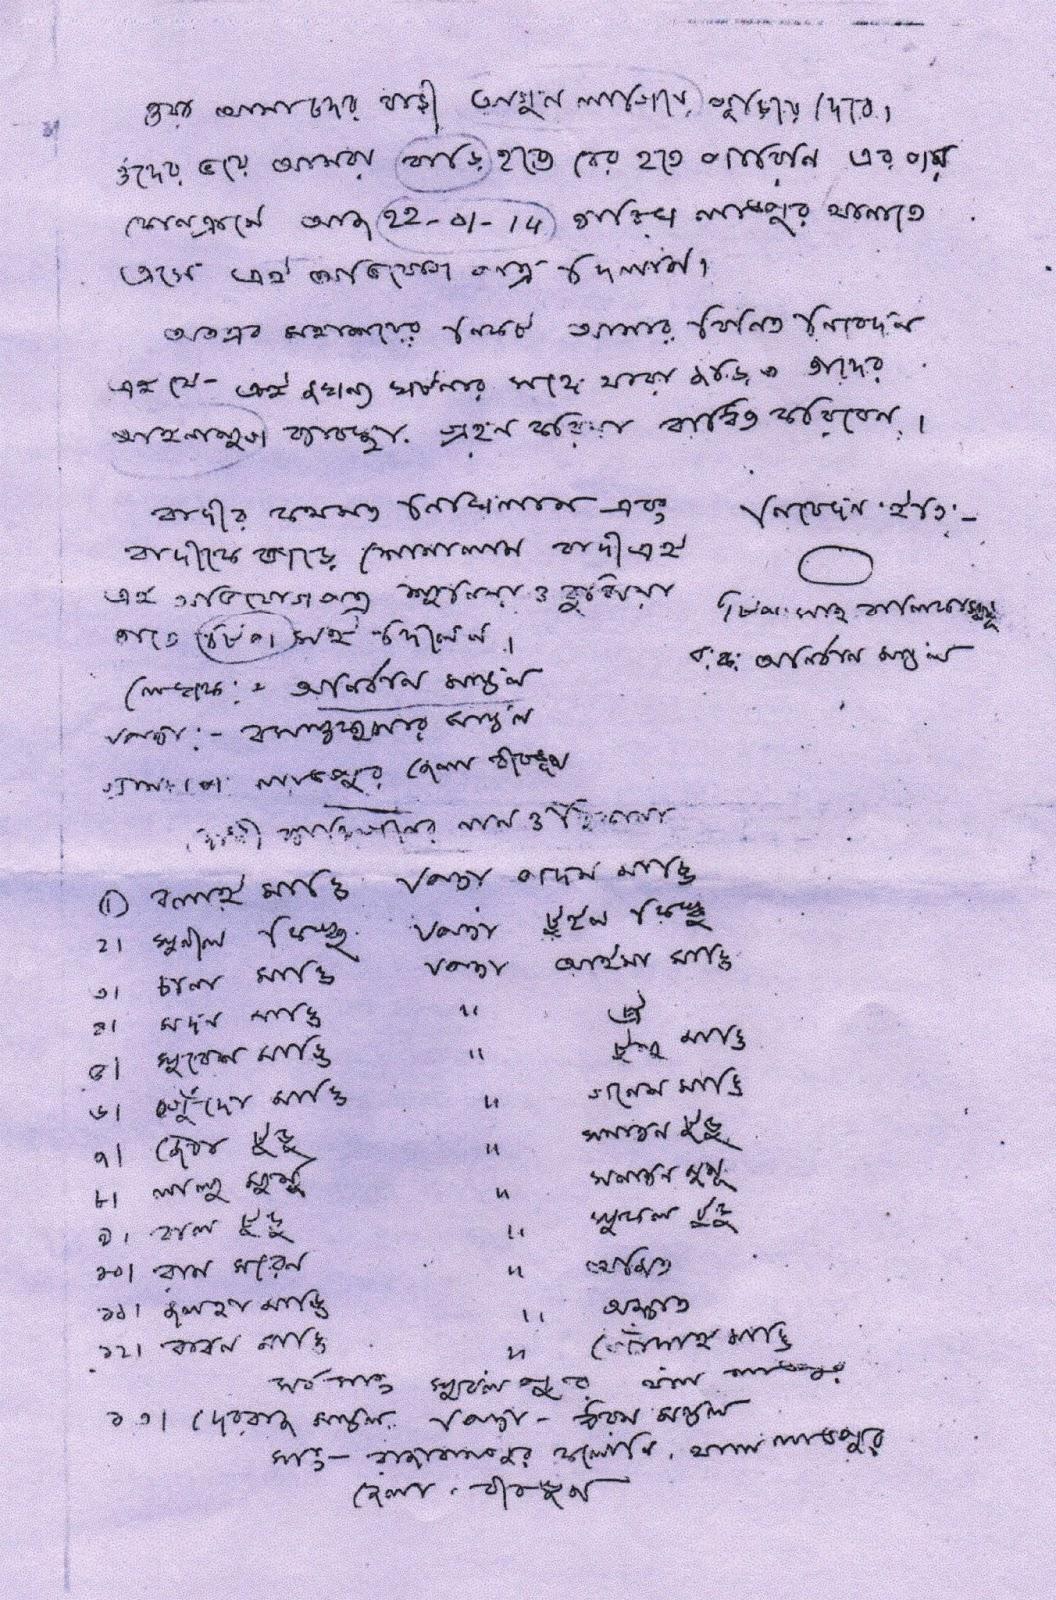 Birbhum FIR- Girl's contradicting accusation